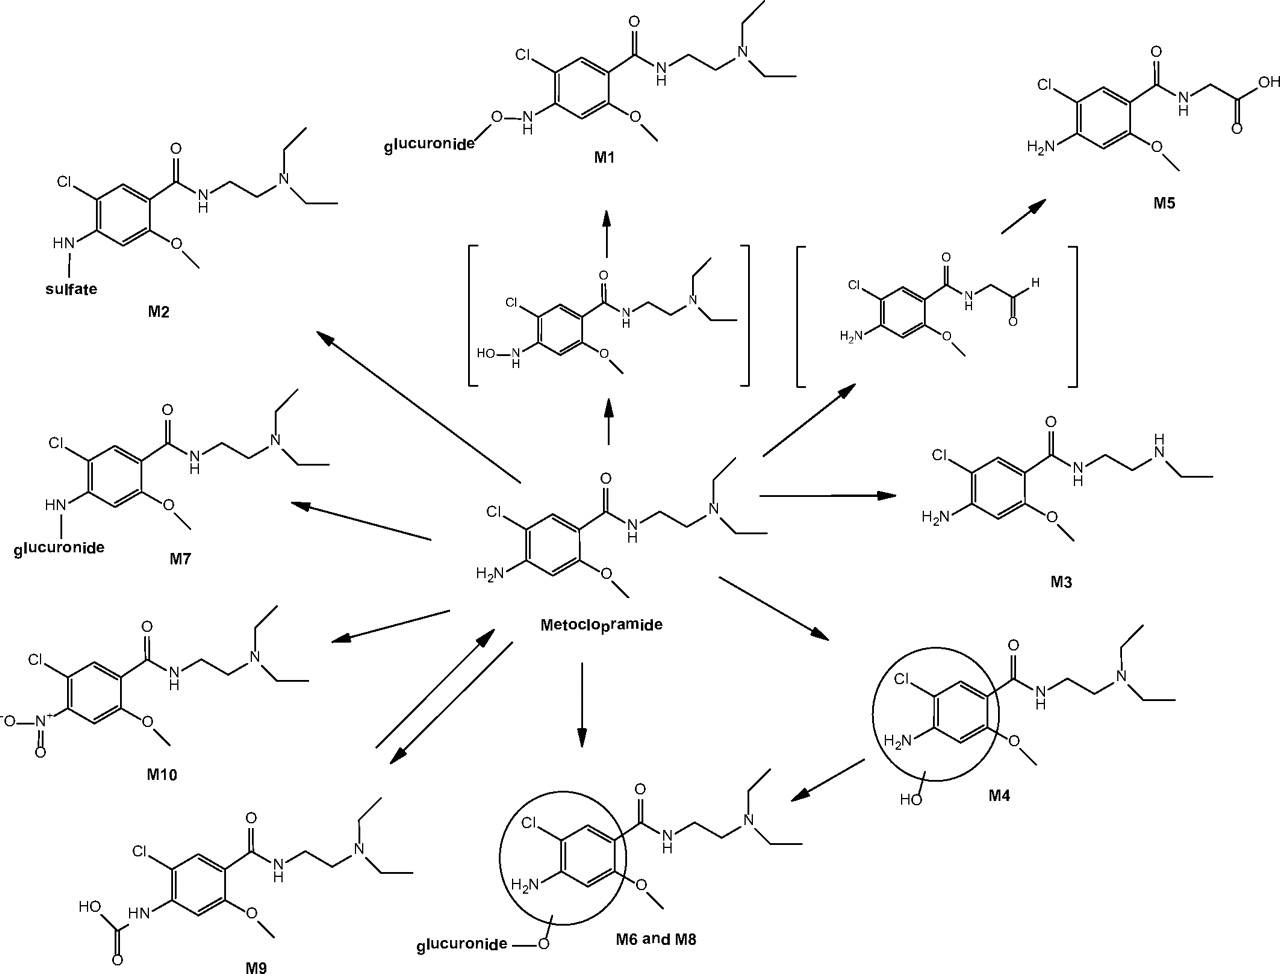 zovirax compresse 800 mg prezzo